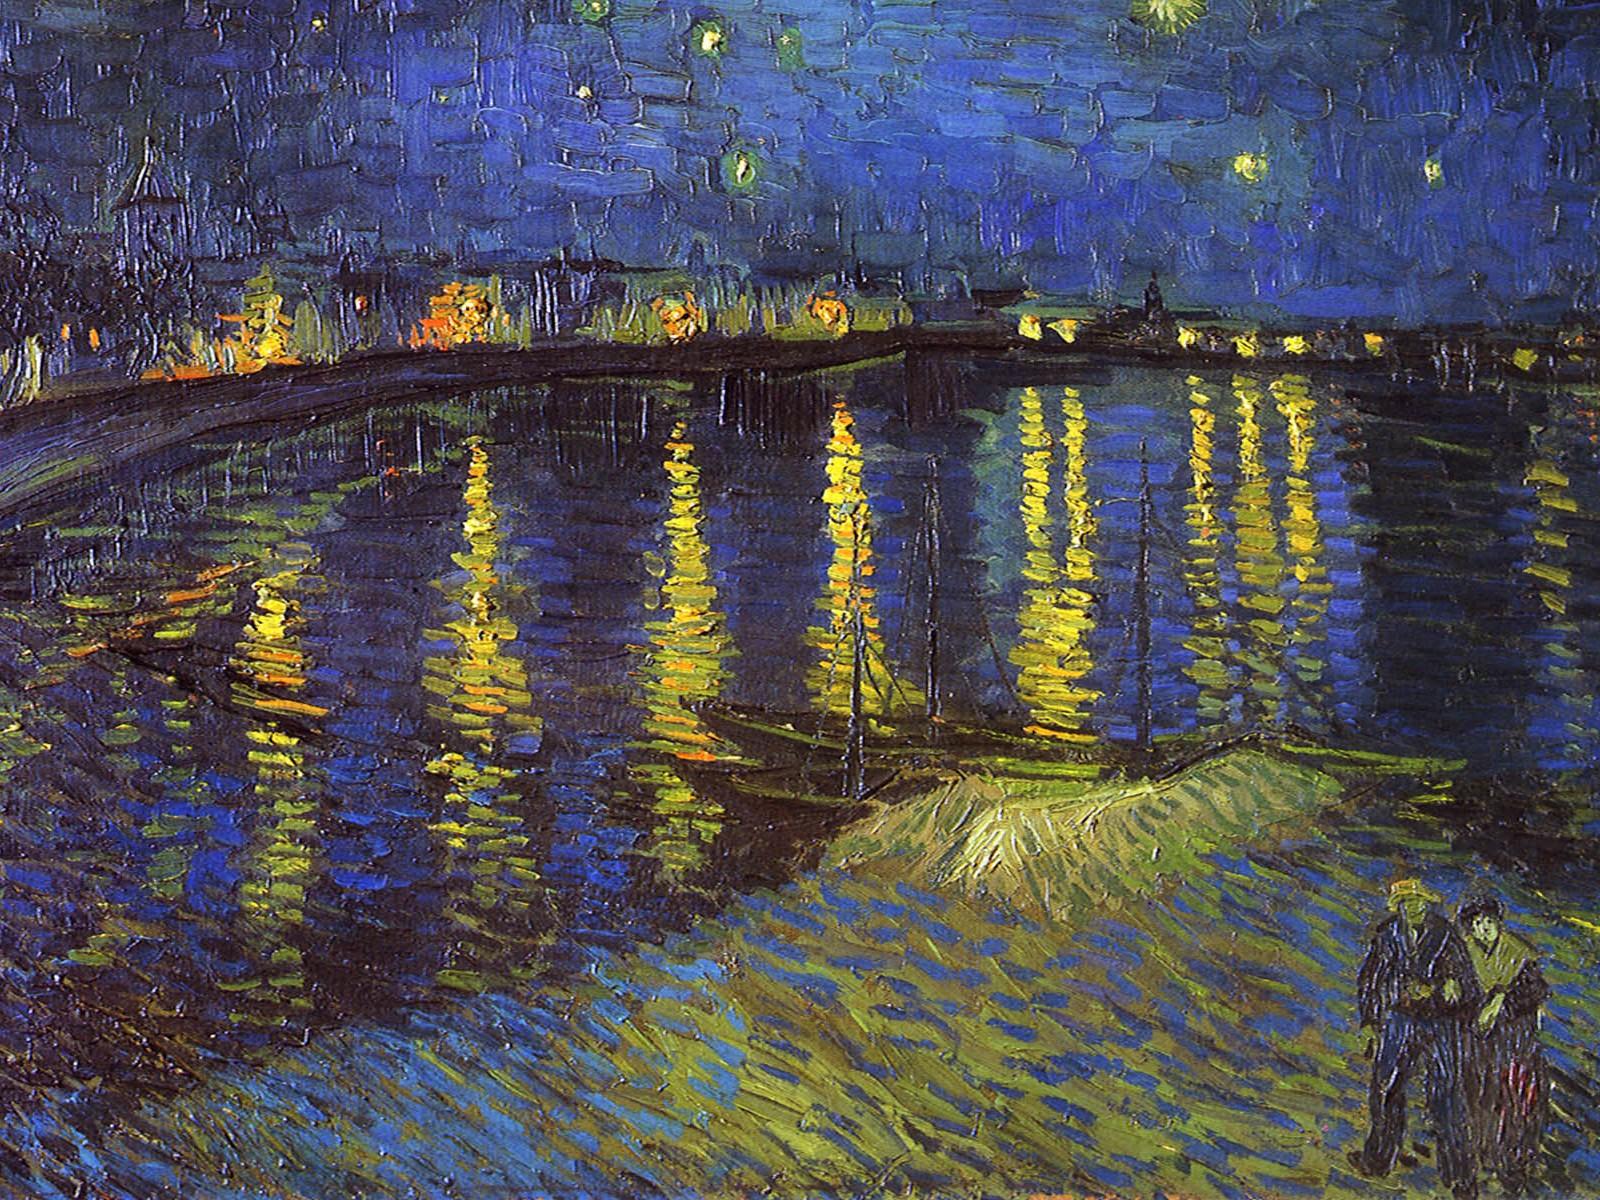 Impressionism Wallpaper Van gogh impressionism 1600x1200